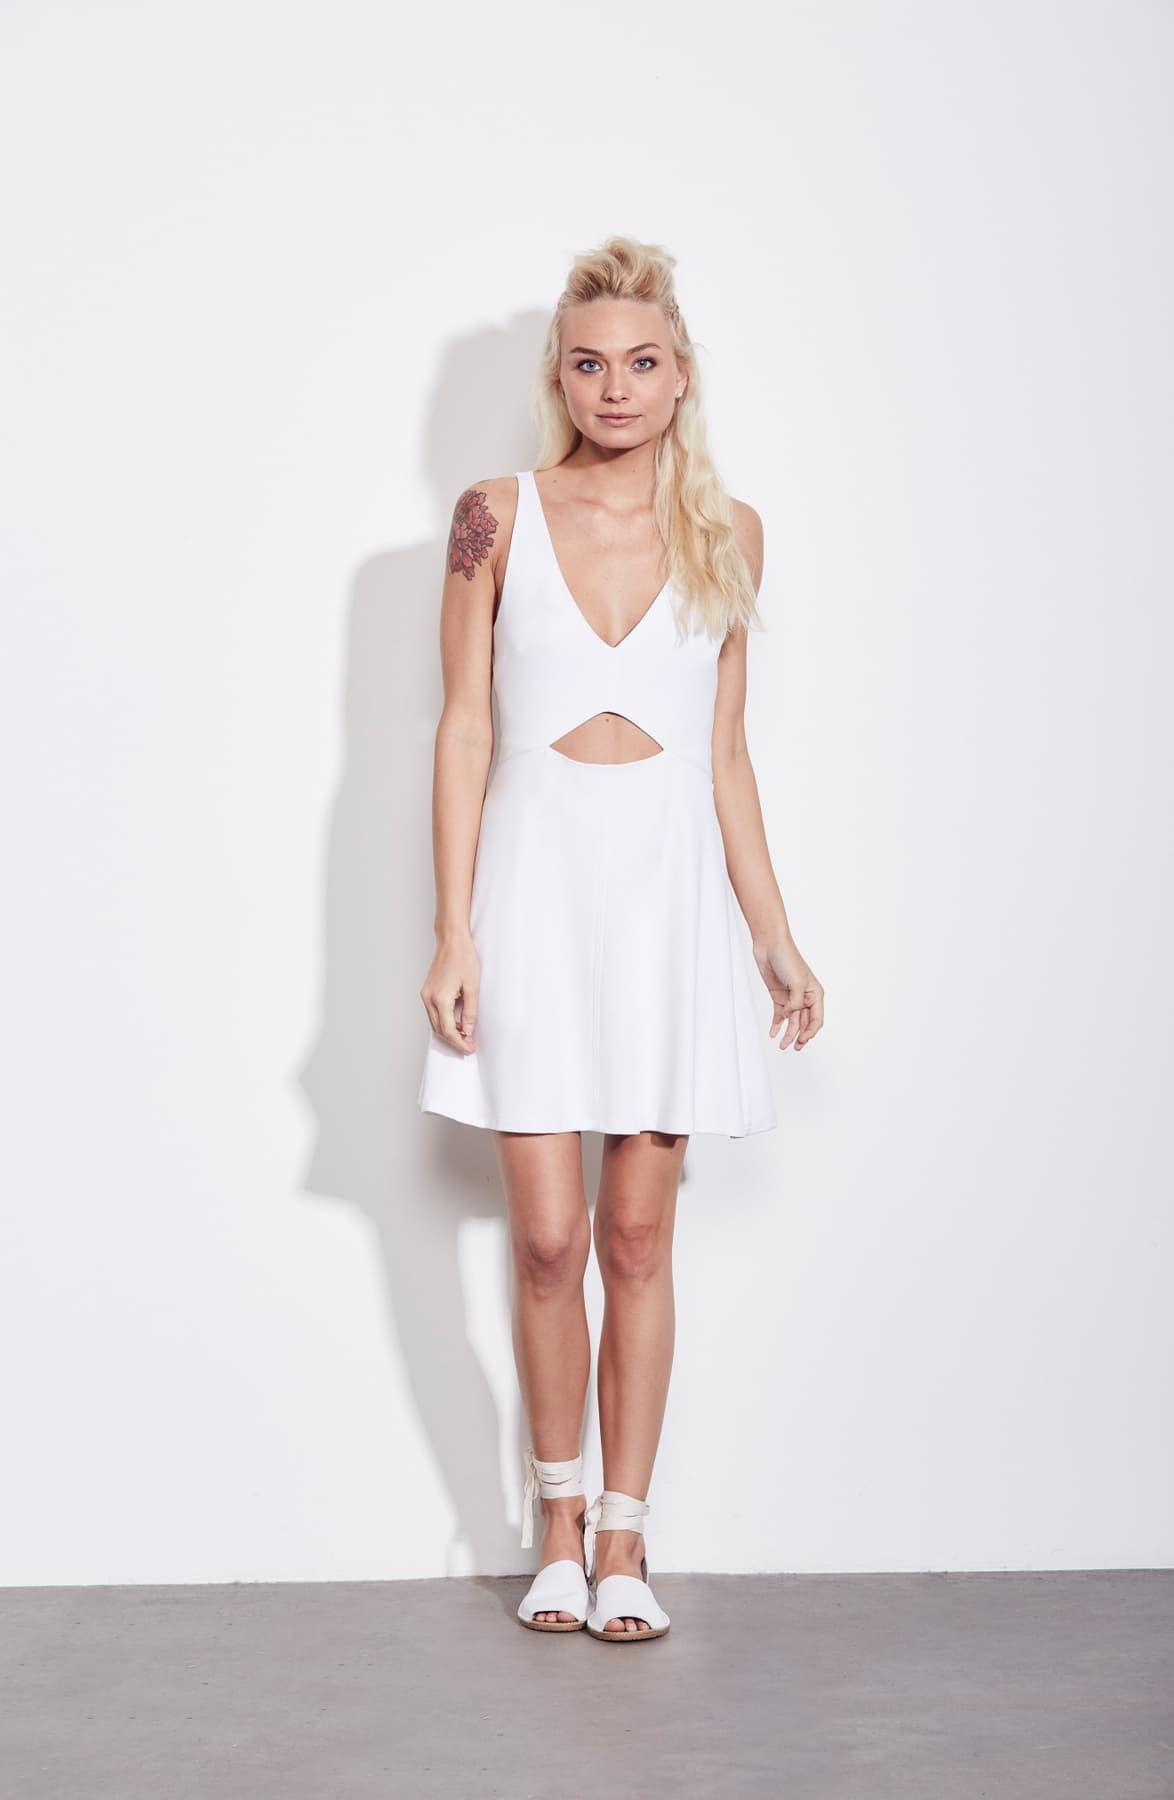 Ali Jay Alfresco At Geoffrey S Front Cutout Mini Dress Nordstrom Rack Mini Dress Dresses Nordstrom Dresses [ 1800 x 1174 Pixel ]